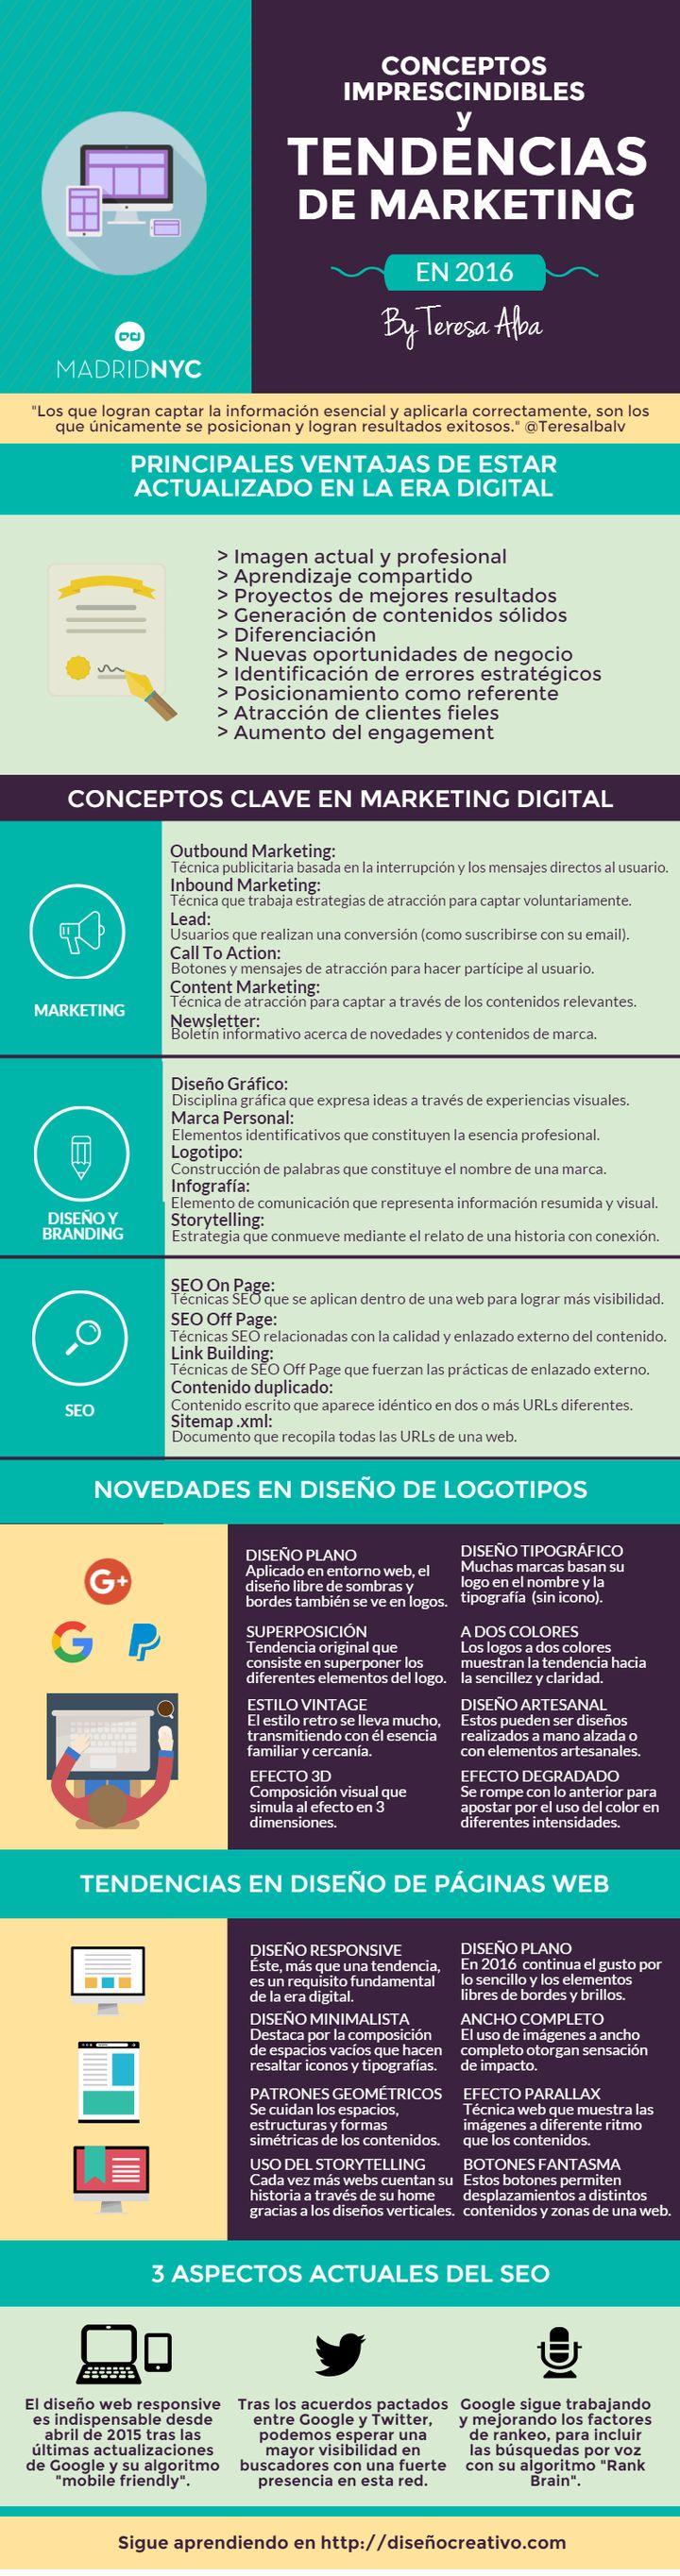 Conceptos imprescindibles y tendencias en marketing #infografía #infographic #marketing